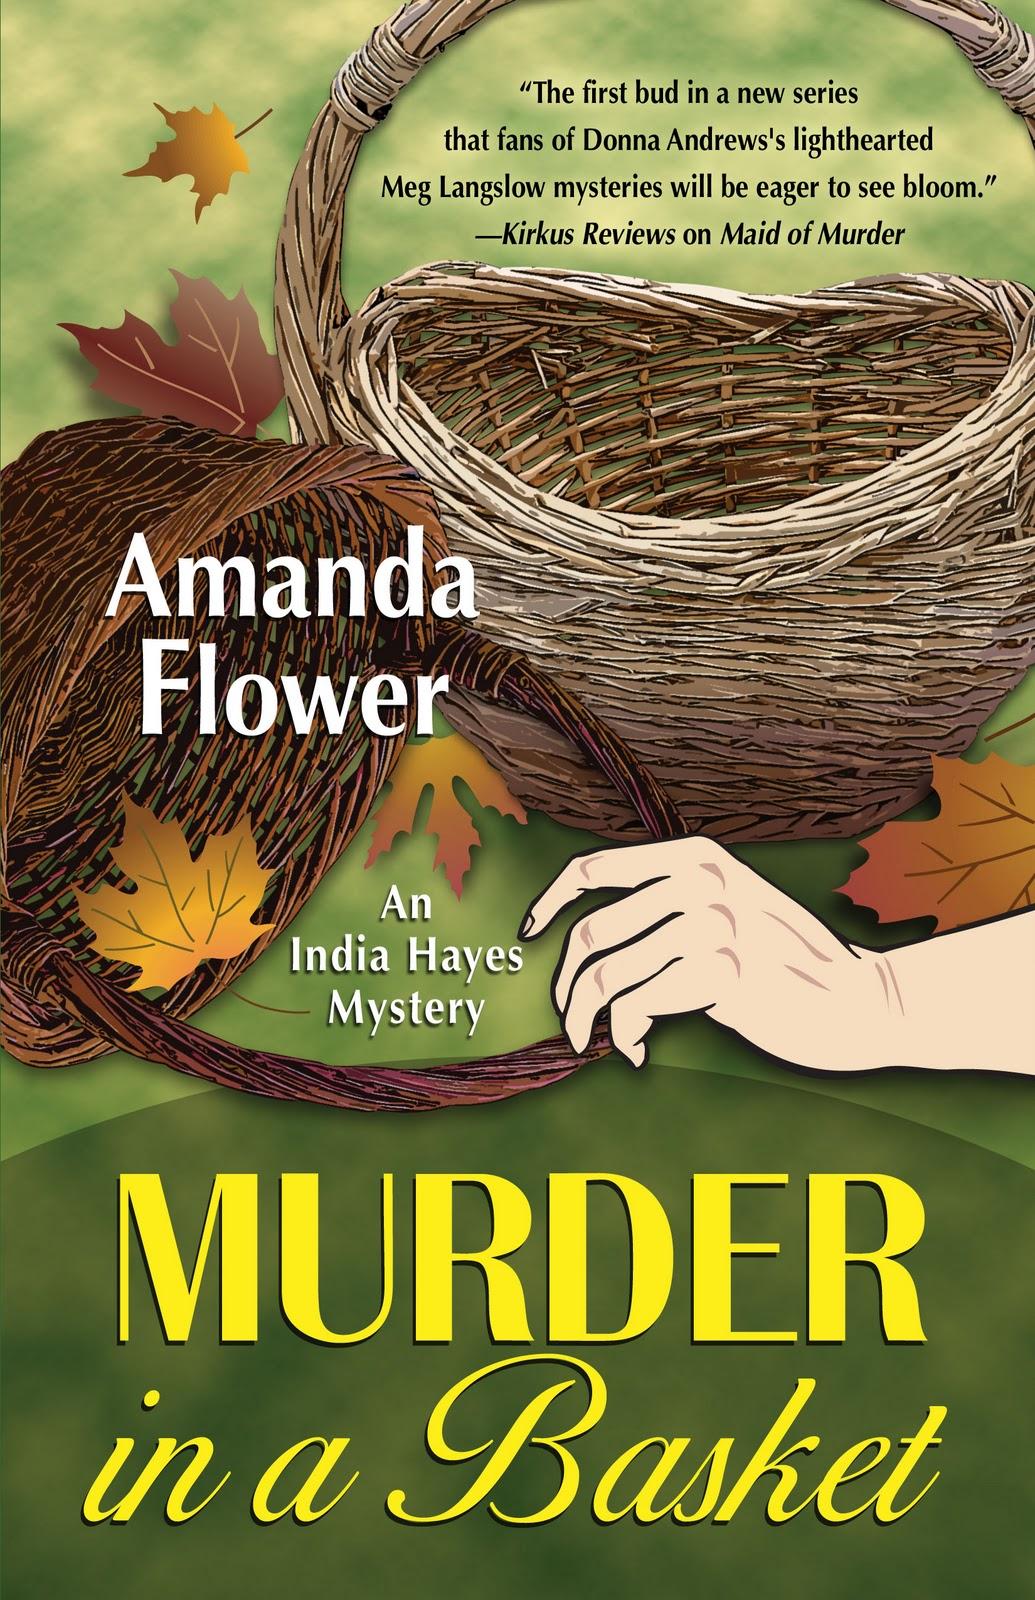 http://4.bp.blogspot.com/-OoOMwnwL0RM/TwnMJ868m-I/AAAAAAAANz8/ksro-i_knSE/s1600/MurderInABasketFront-1.jpg